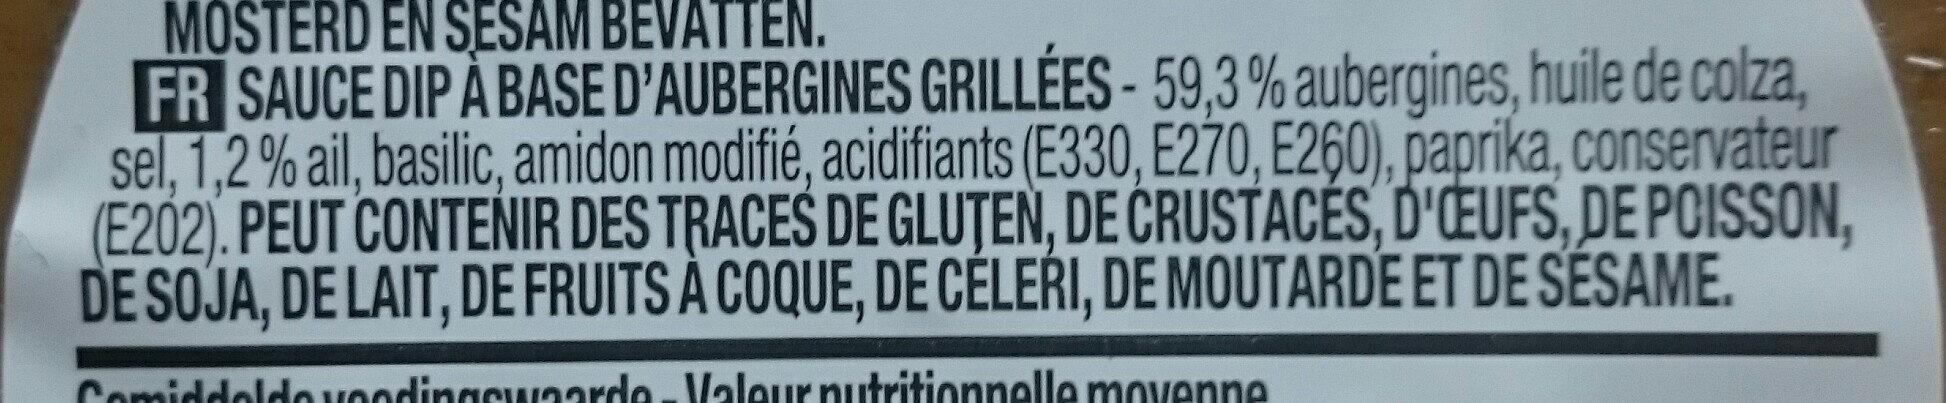 Crème d'Aubergines - Ingredients - fr